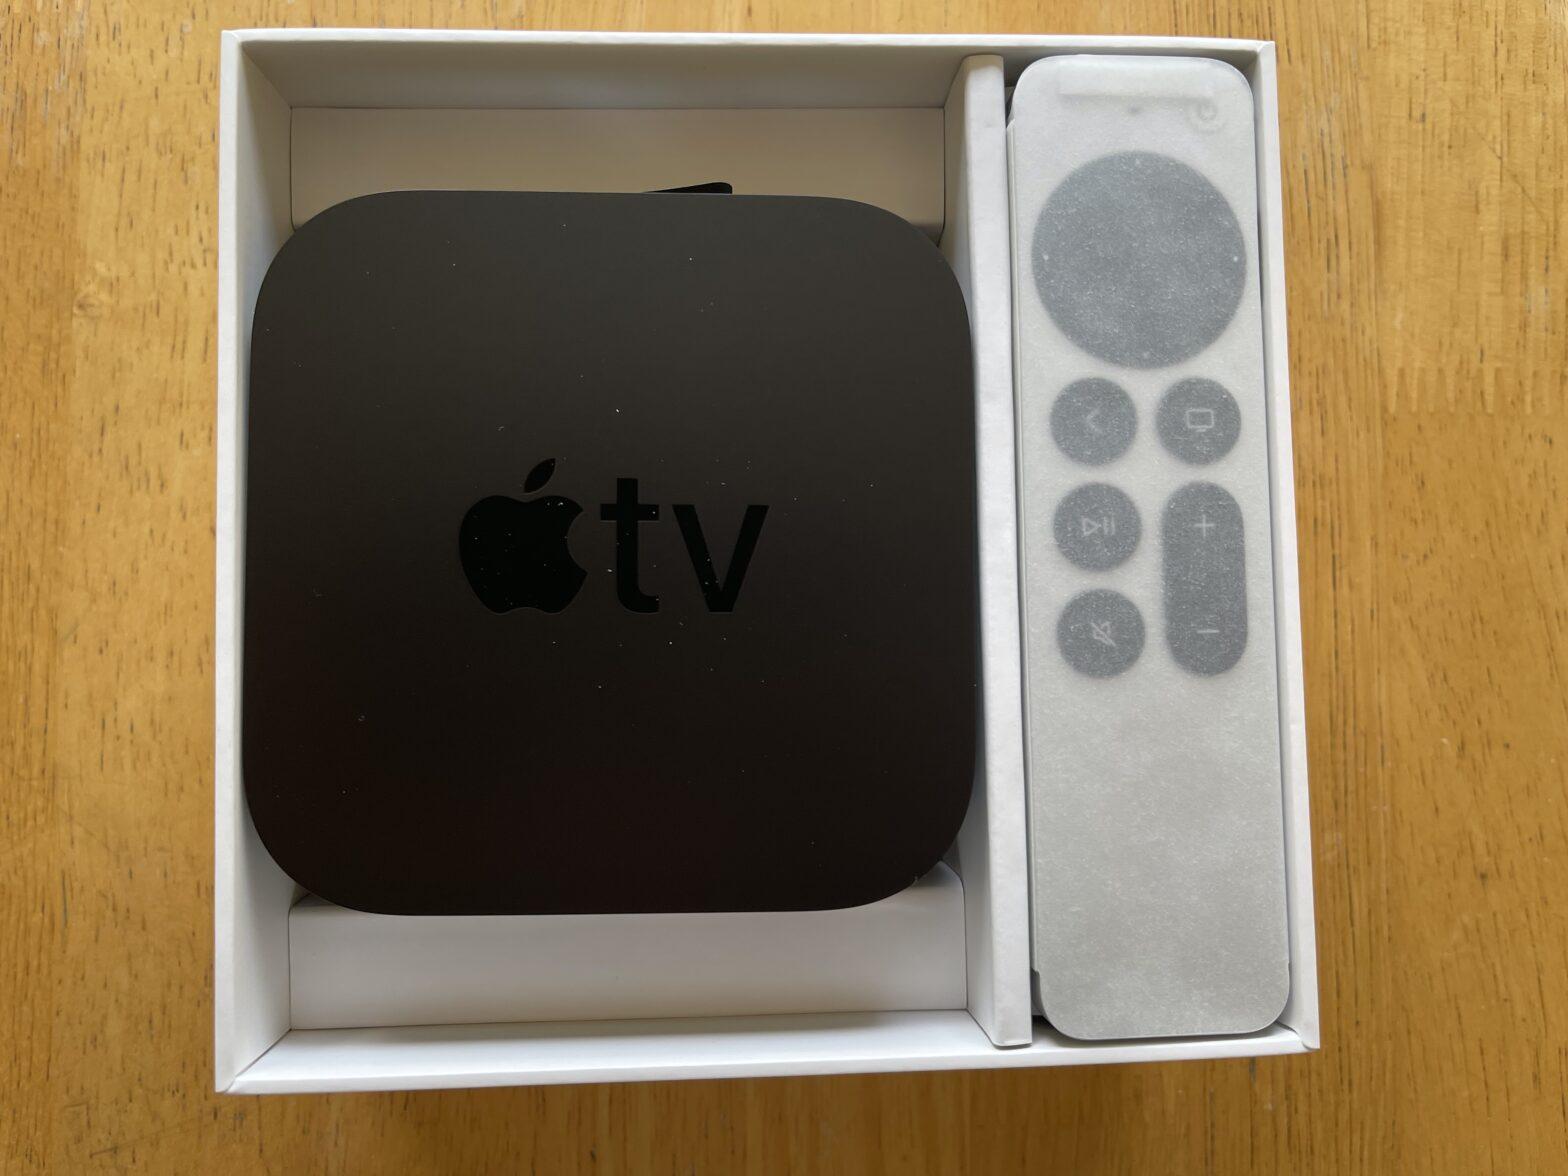 Apple TV 4K 6th Generation Contents